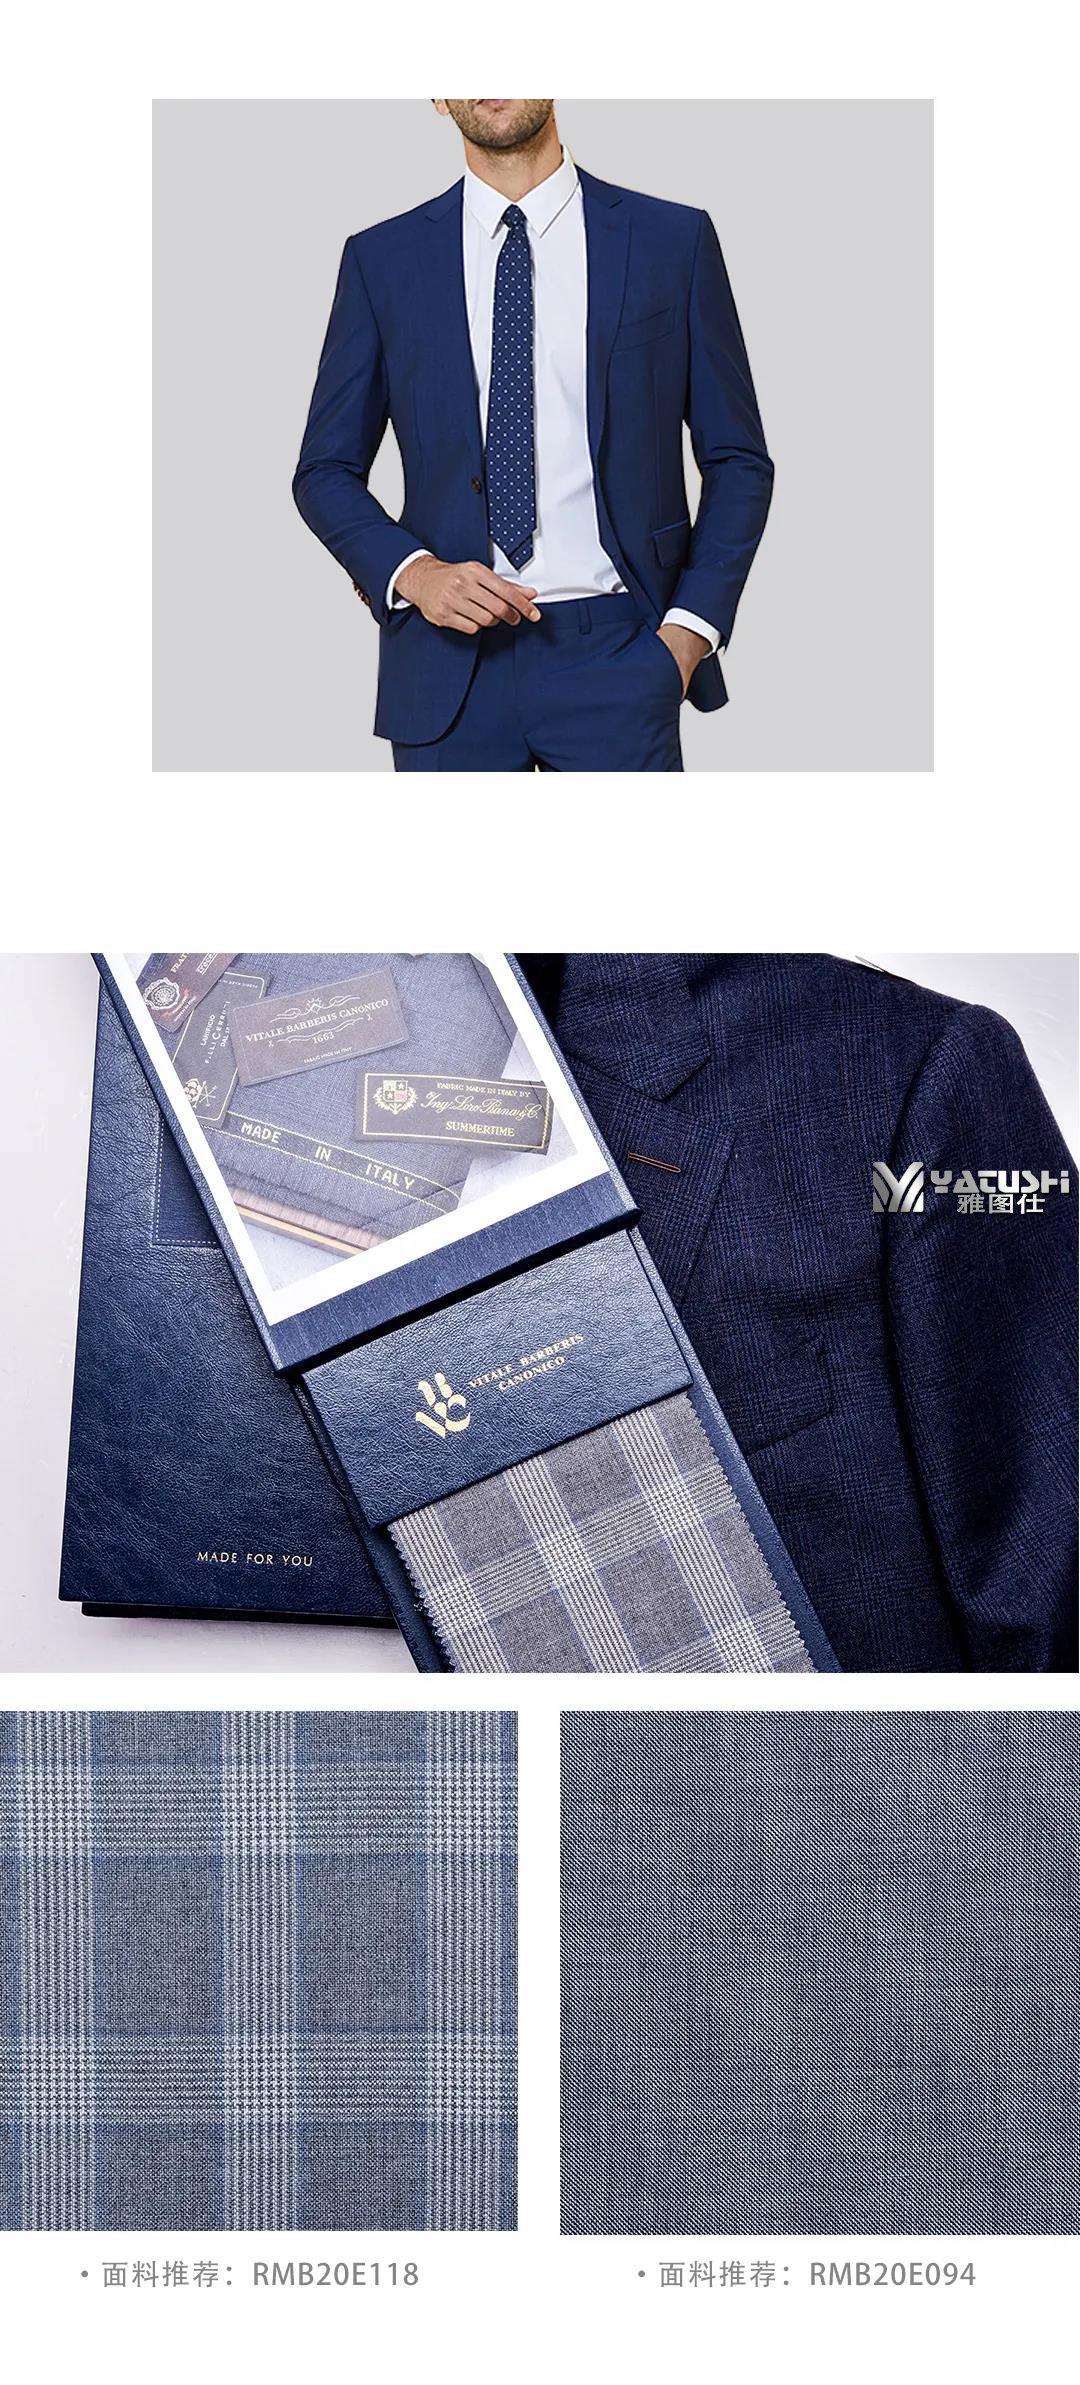 VBC西服布料的衣服是怎样的呢